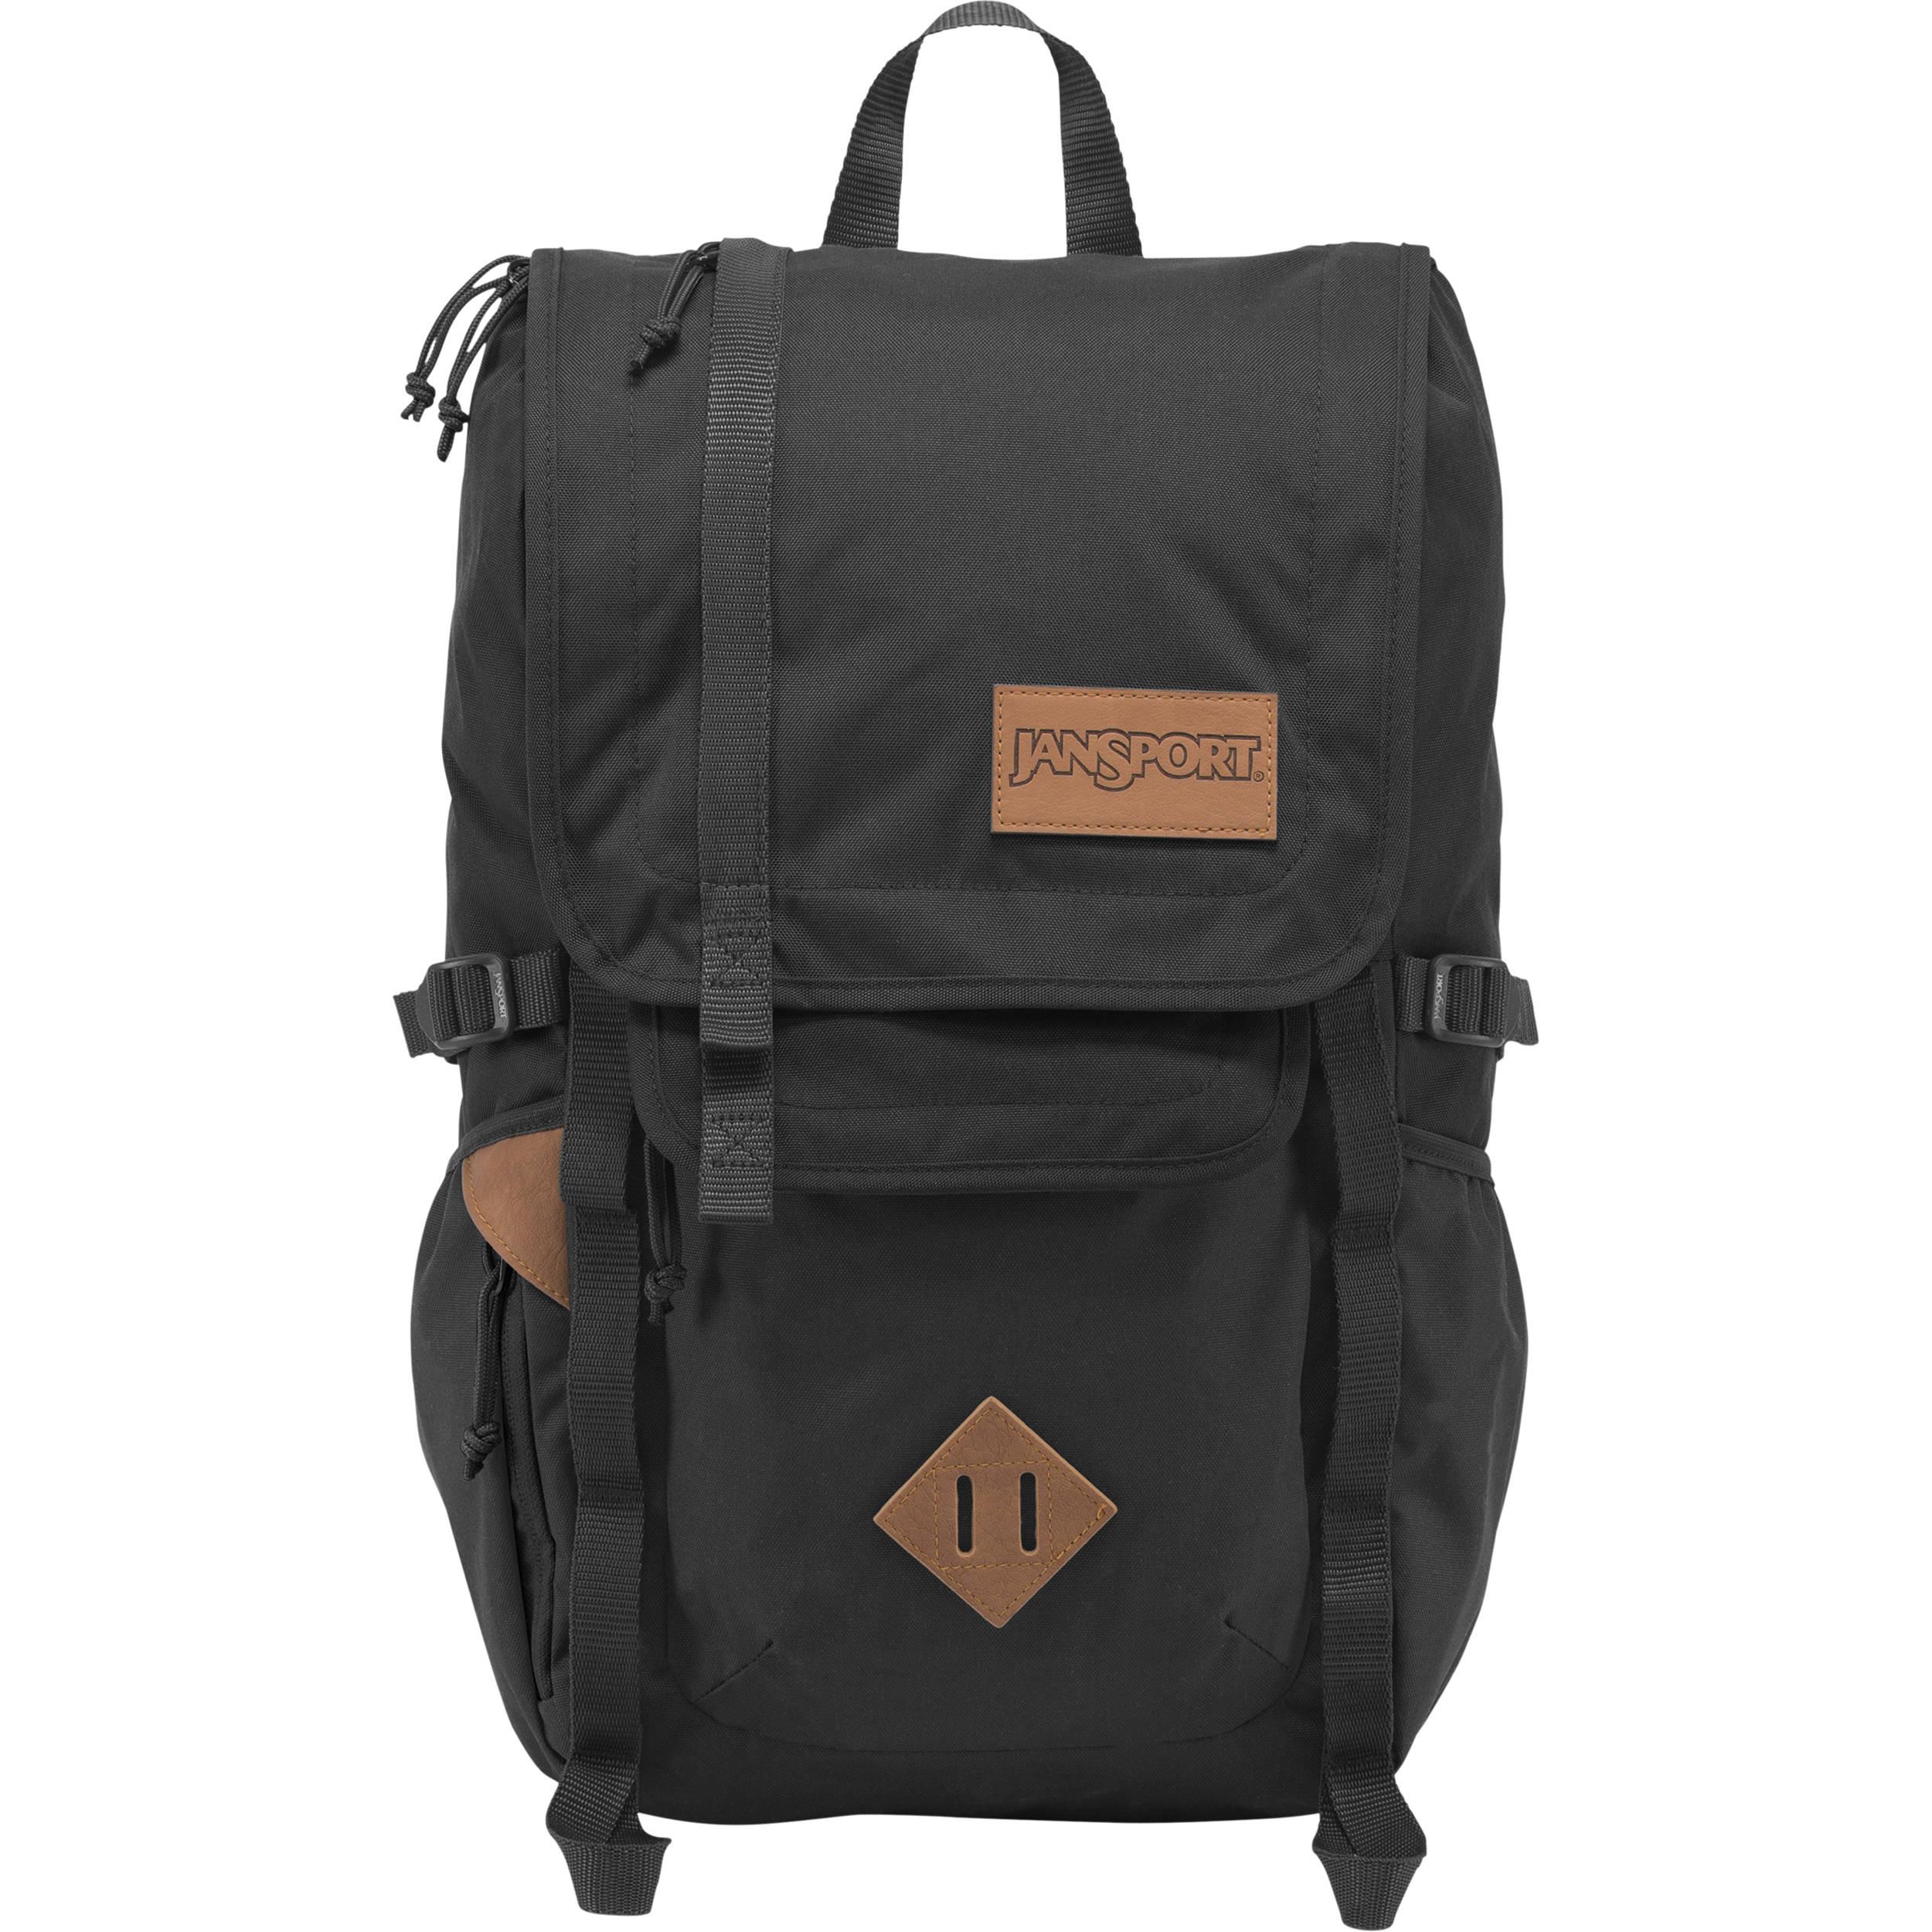 JanSport Hatchet 28L Backpack (Black) JS00T52S008 B&H Photo